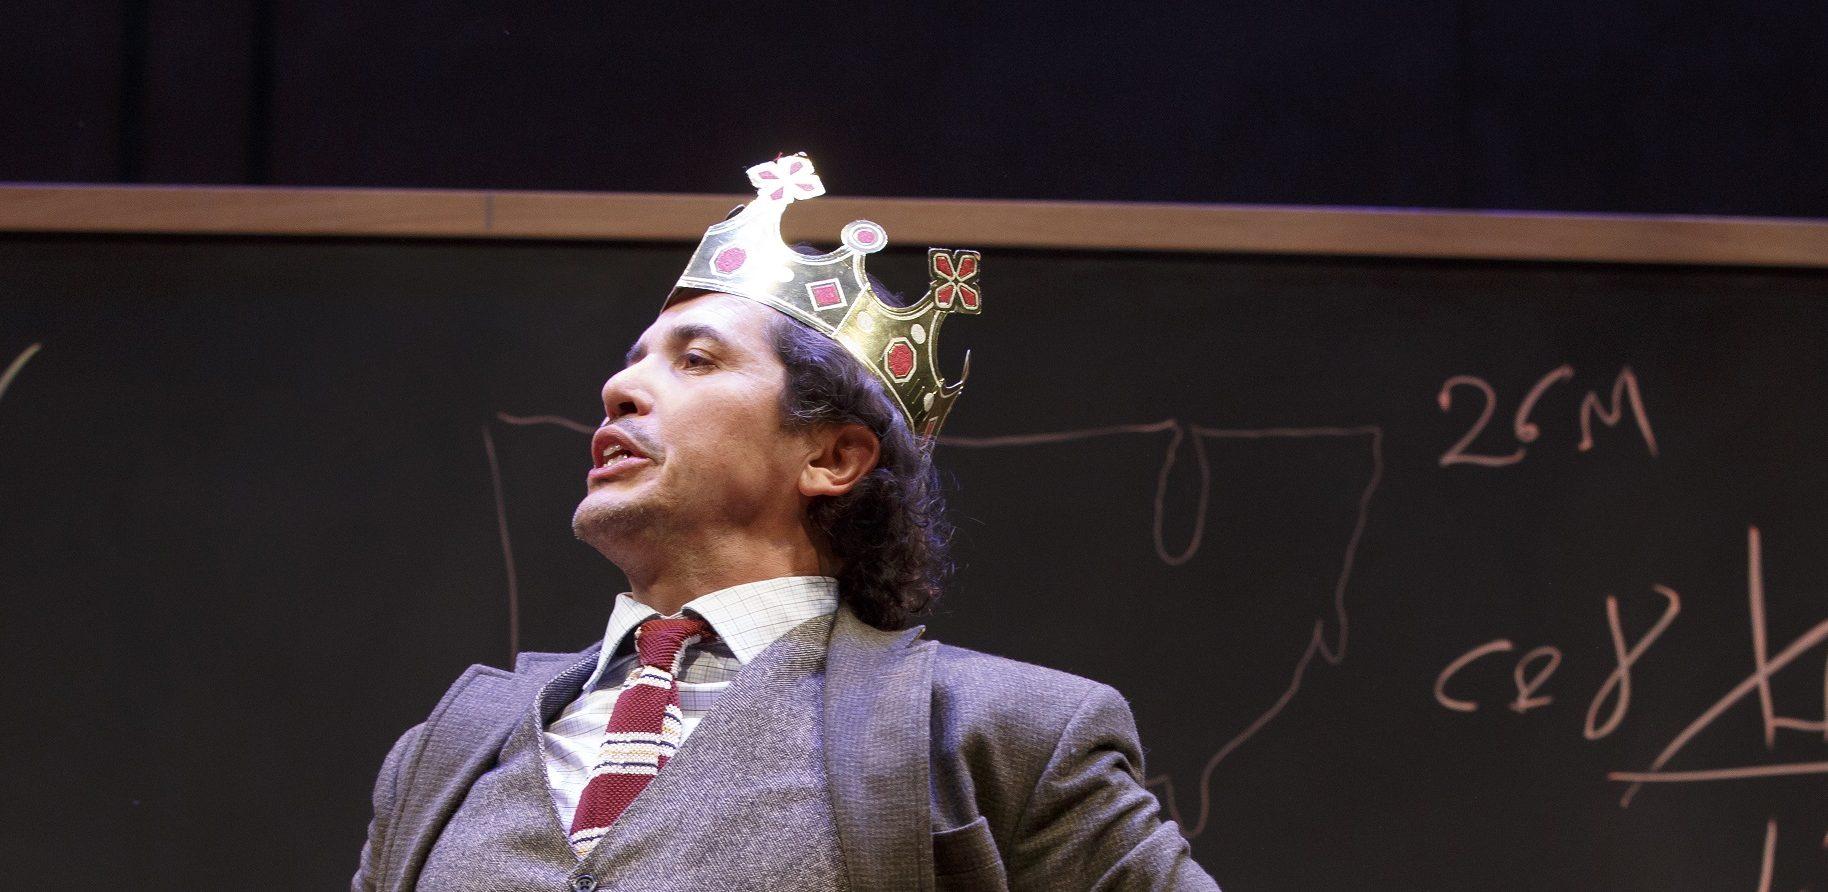 TRAILER: John Leguizamo's Broadway Show 'Latin History for Morons' Comes to Netflix in November